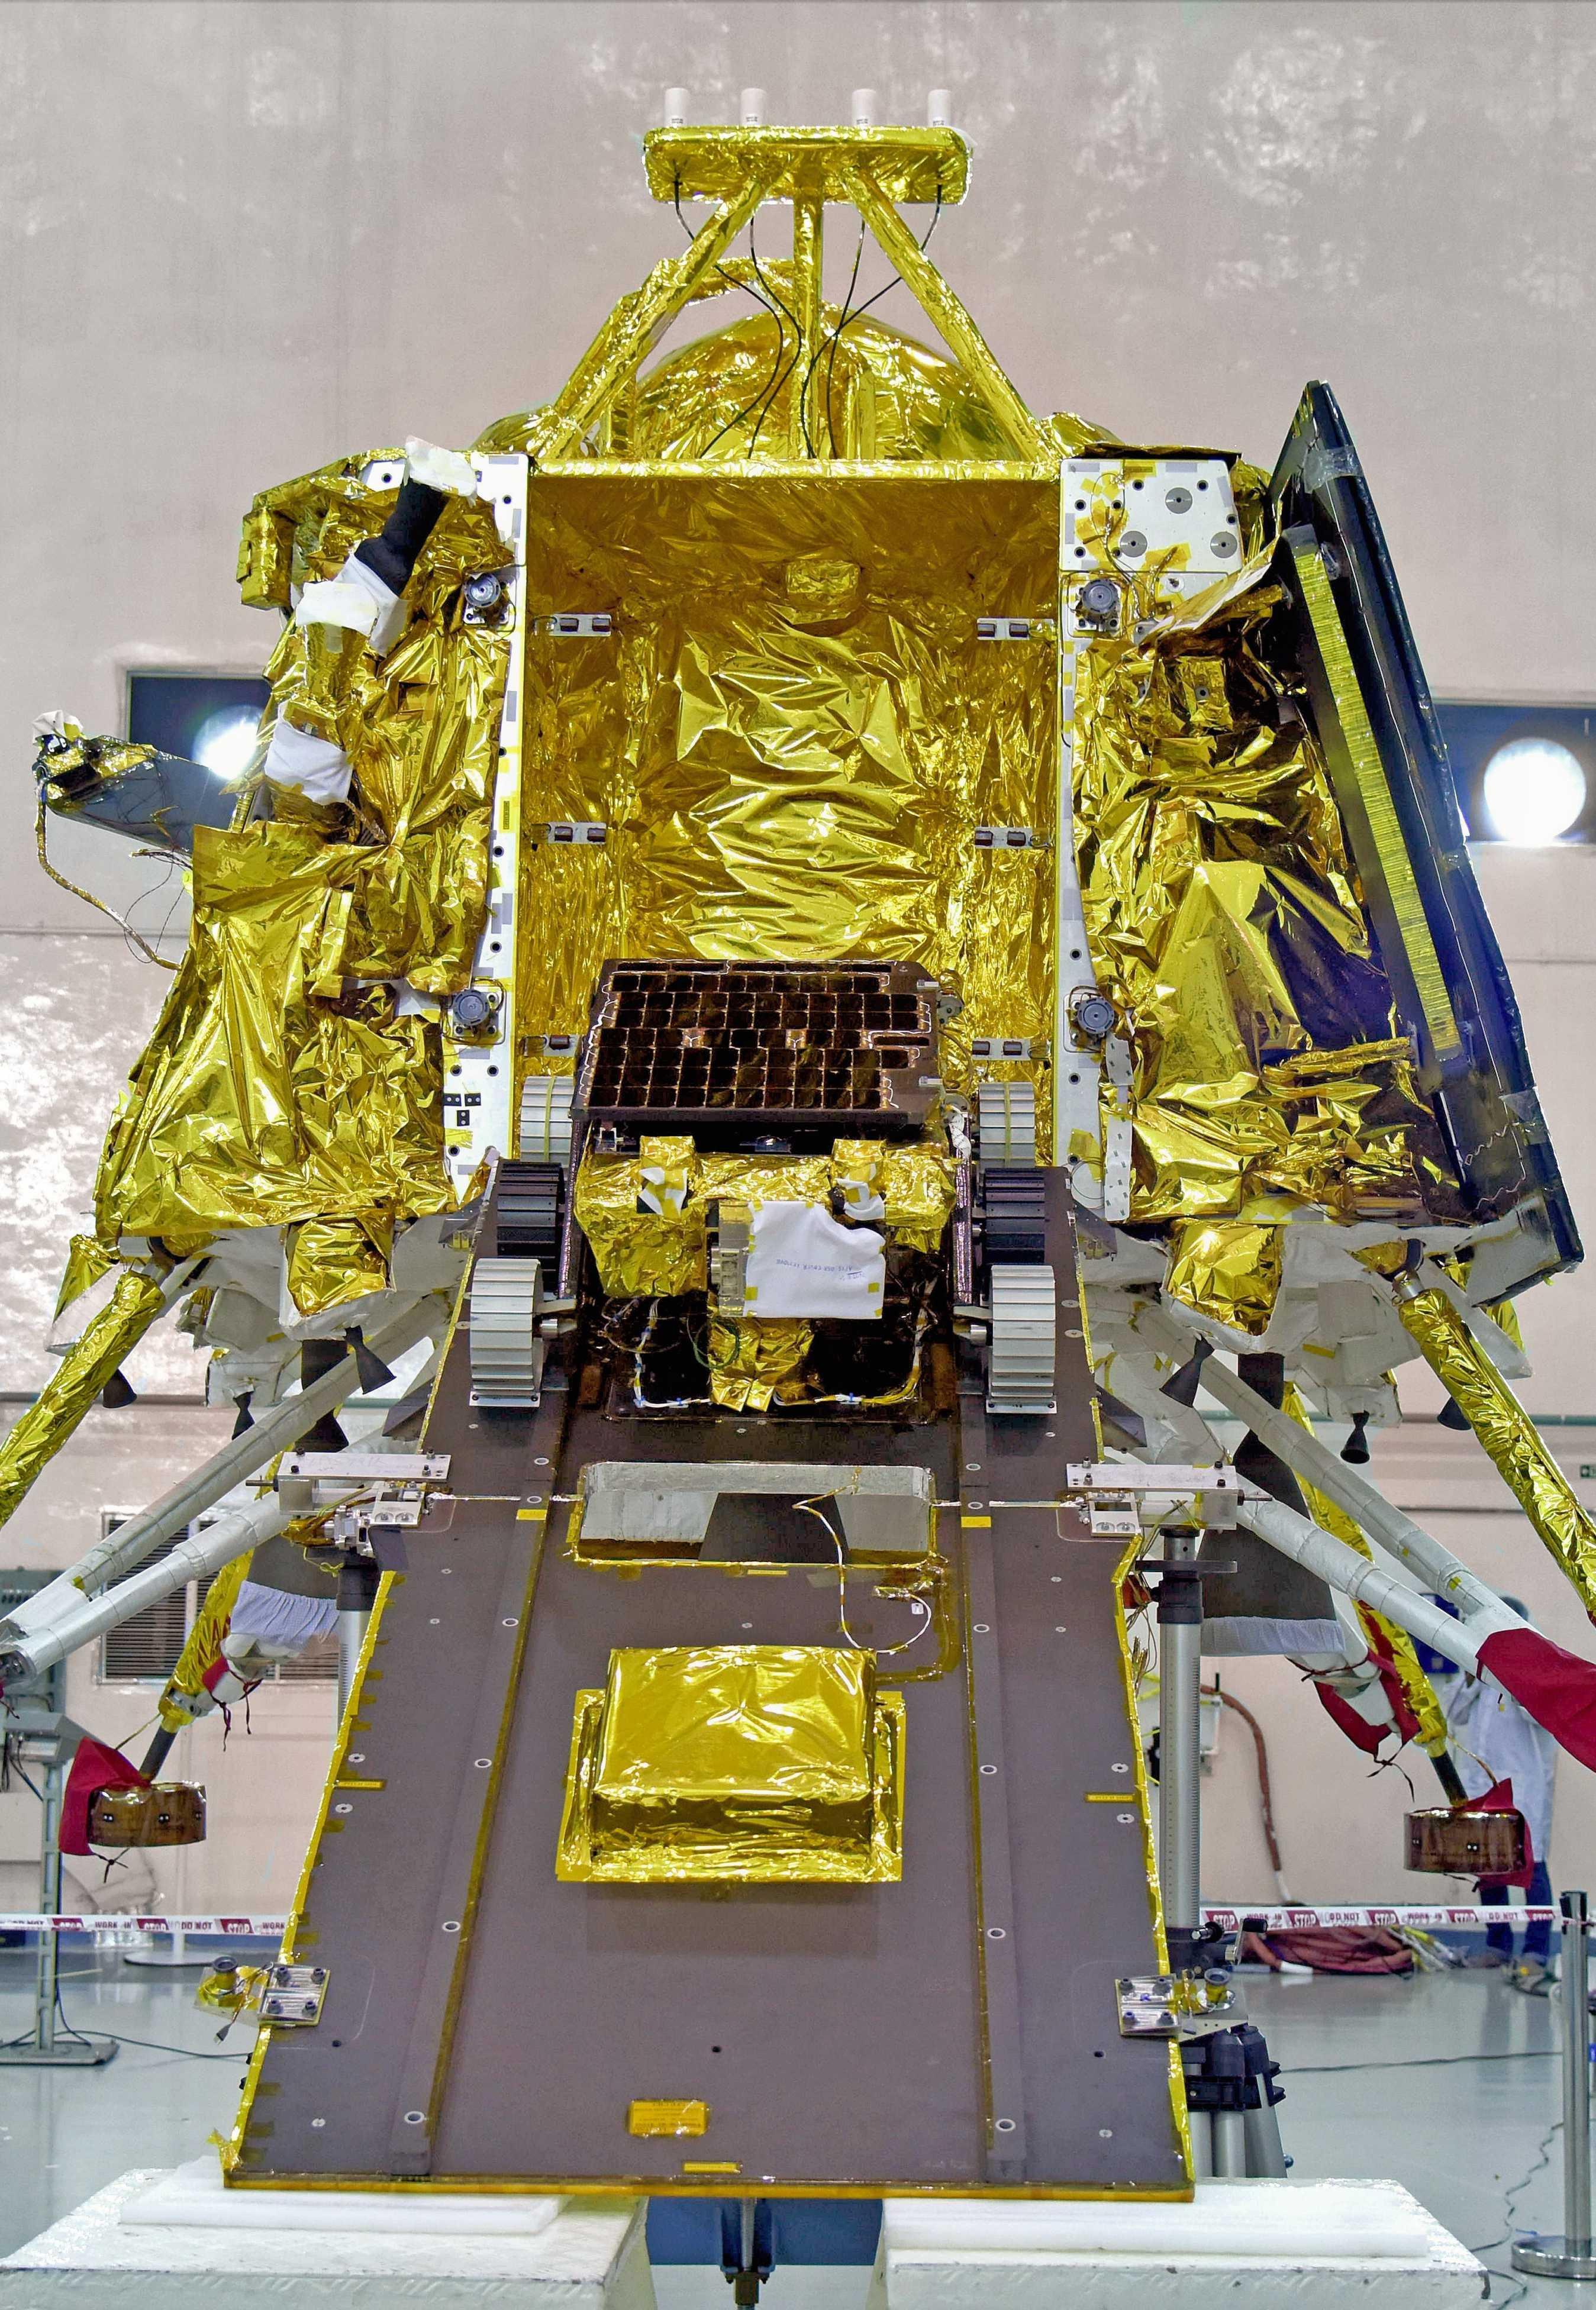 Chandrayaan-2 Pragyan rover Vikram lander (ISRO) 1 crop (c)